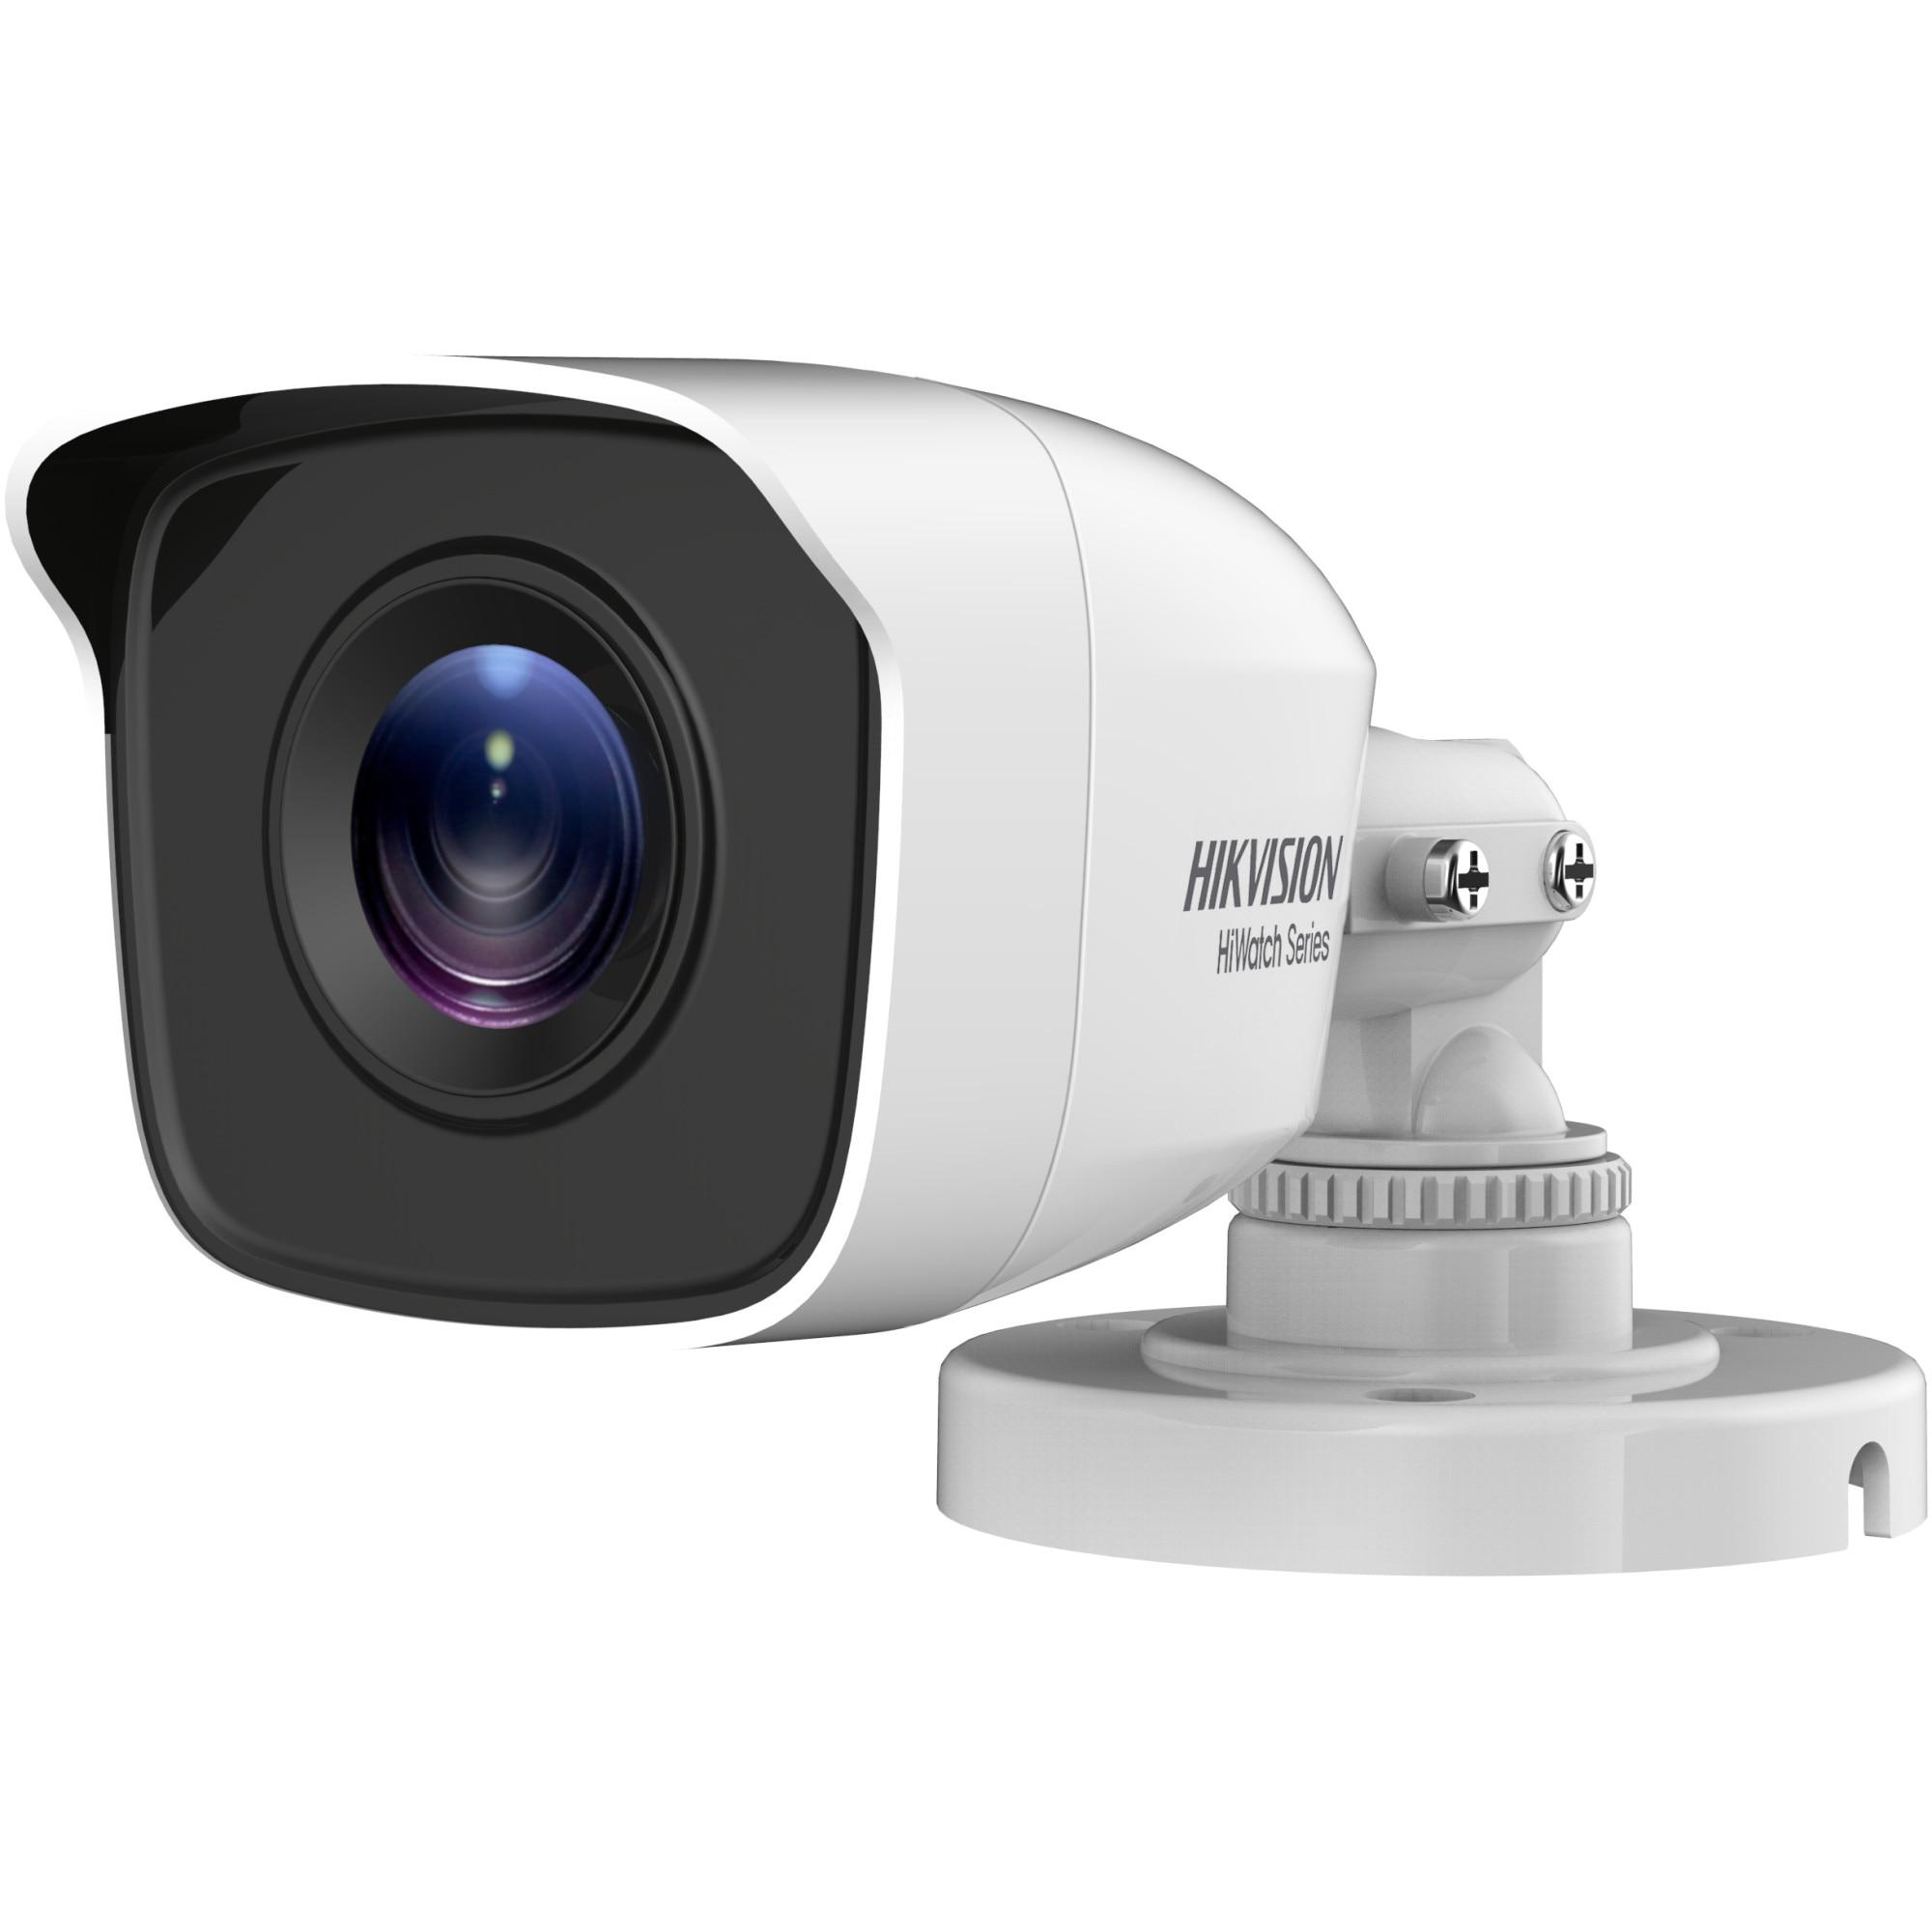 Fotografie Camera de supraveghere Hikvision HiWatch Turbo HD Bullet, 4MP, 2.8mm Lens, EXIR Bullet, 20m IR, IP66, Alb